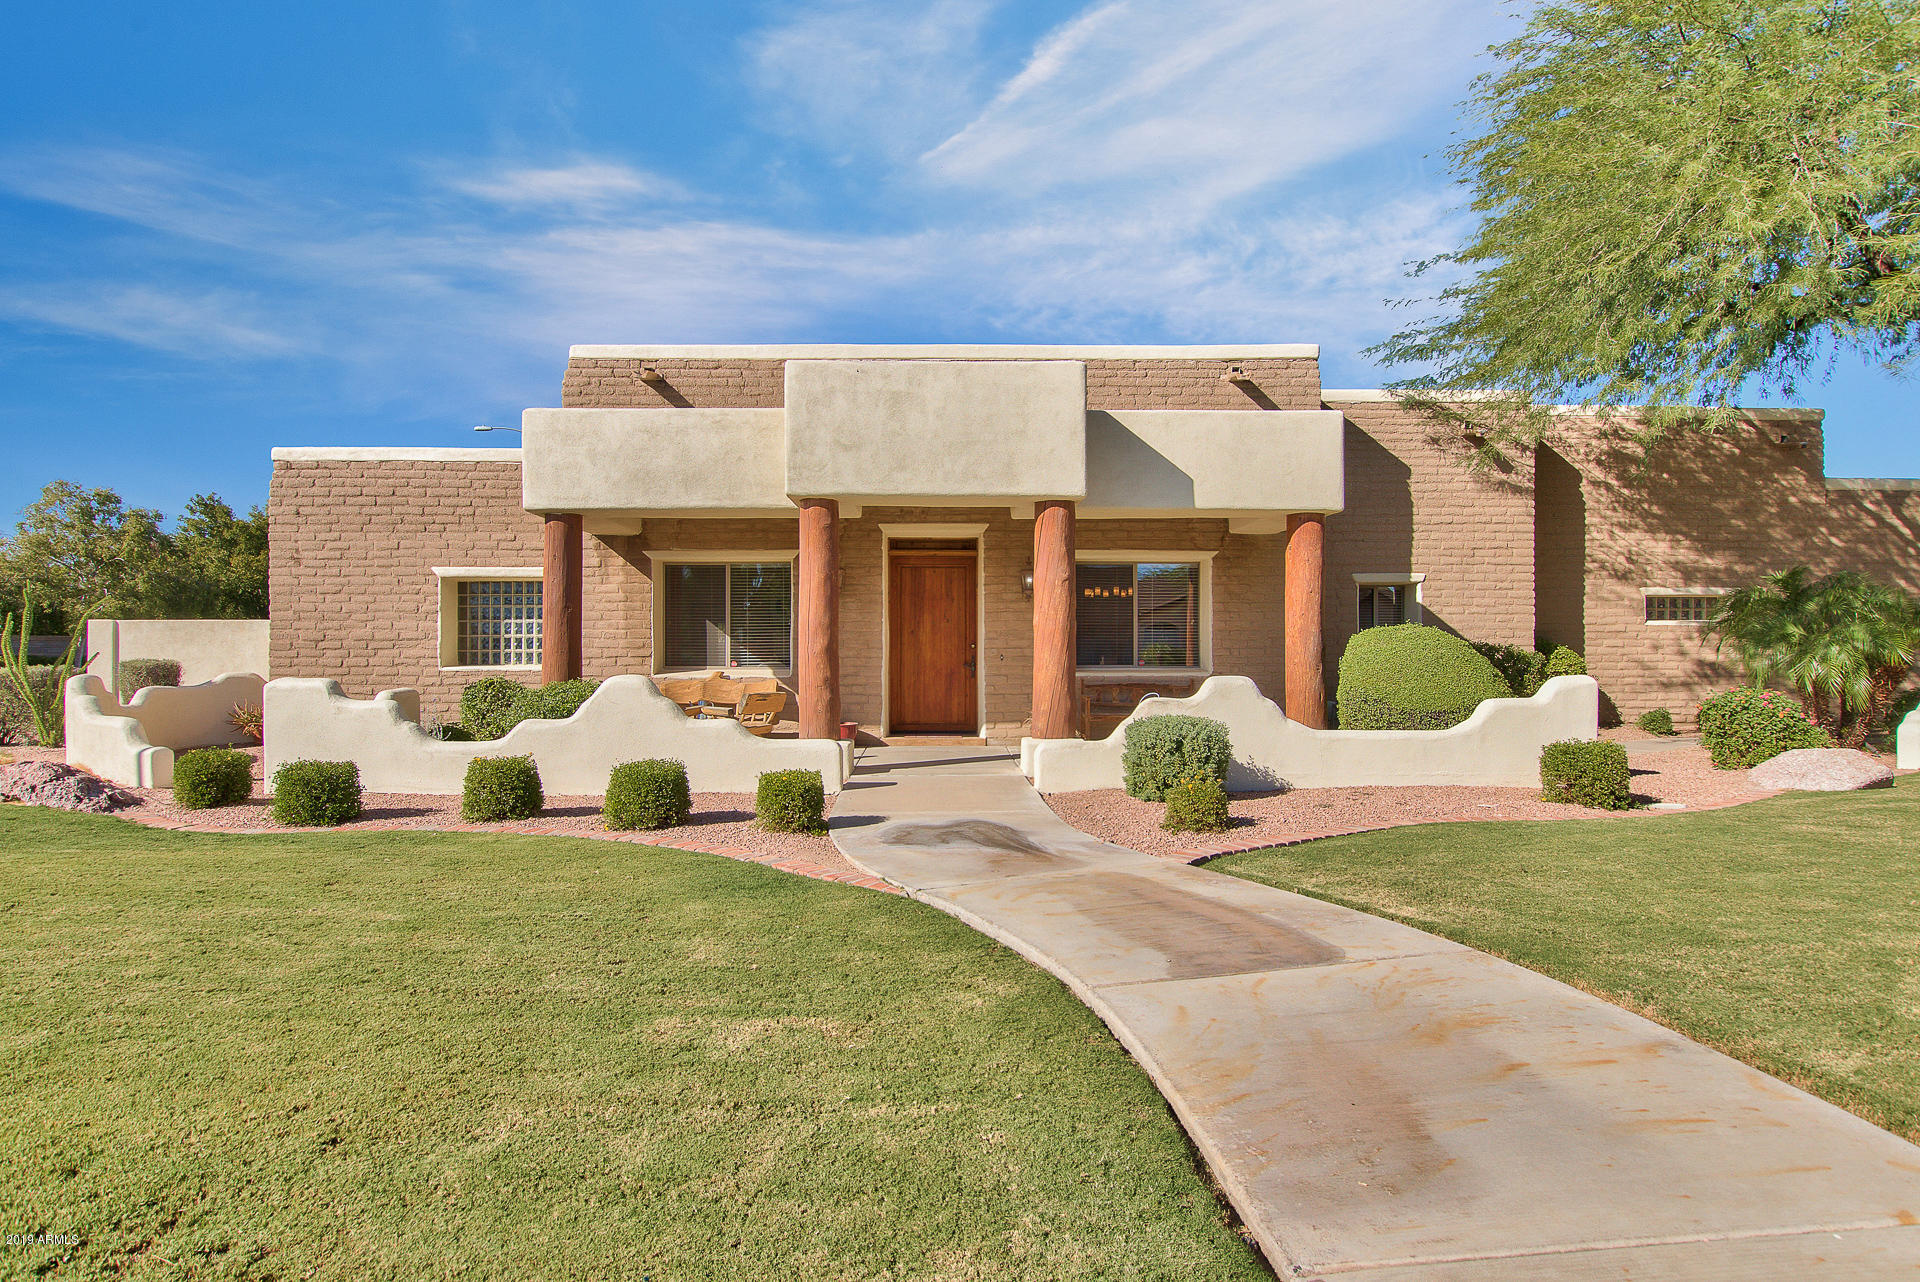 Photo of 4006 E HUBER Street, Mesa, AZ 85205